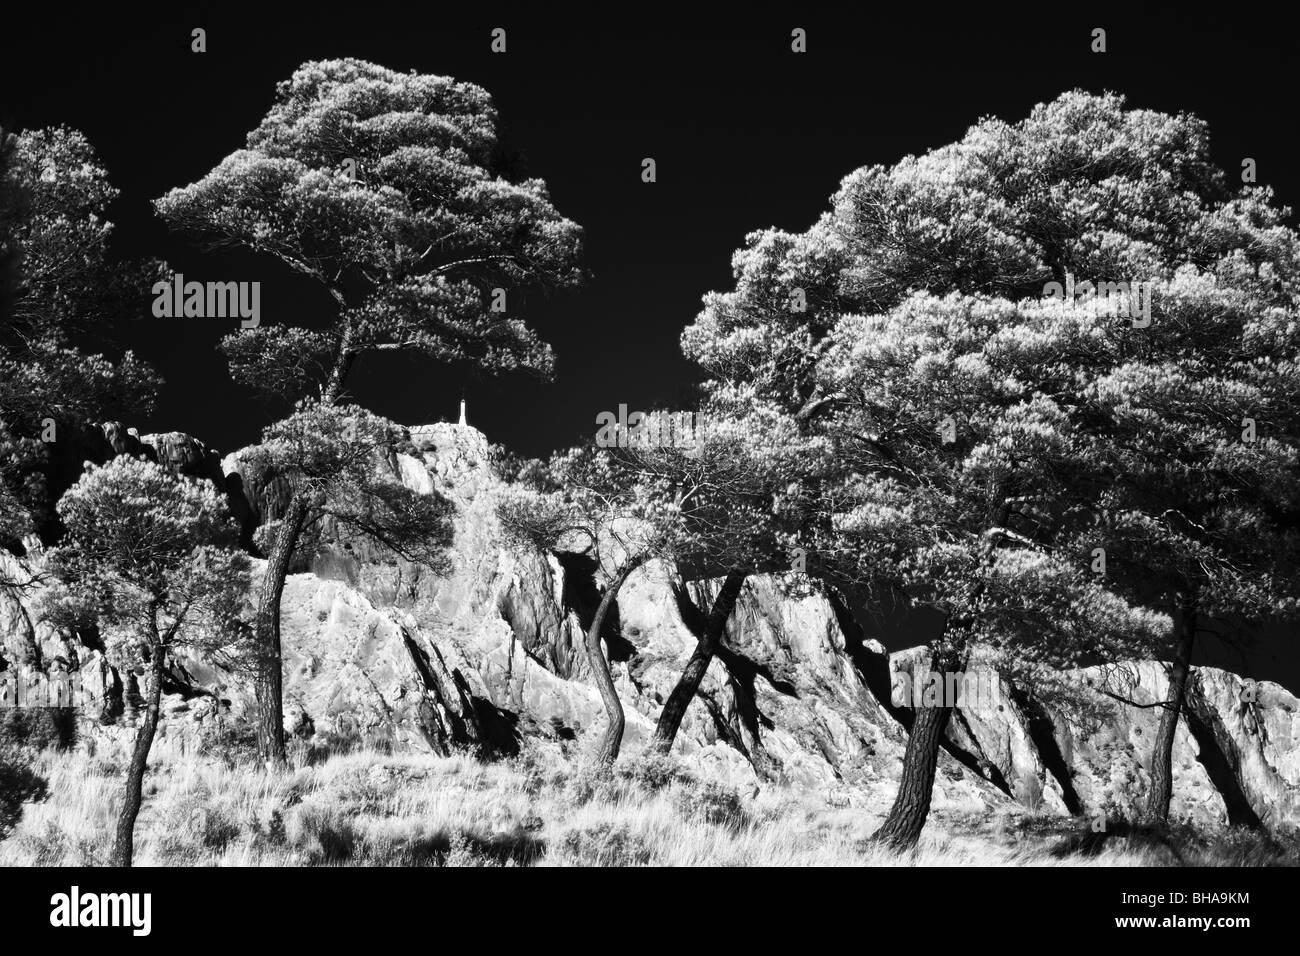 Montagne Ste Victoire, Bouches-du-Rhone, Provence, France - Stock Image